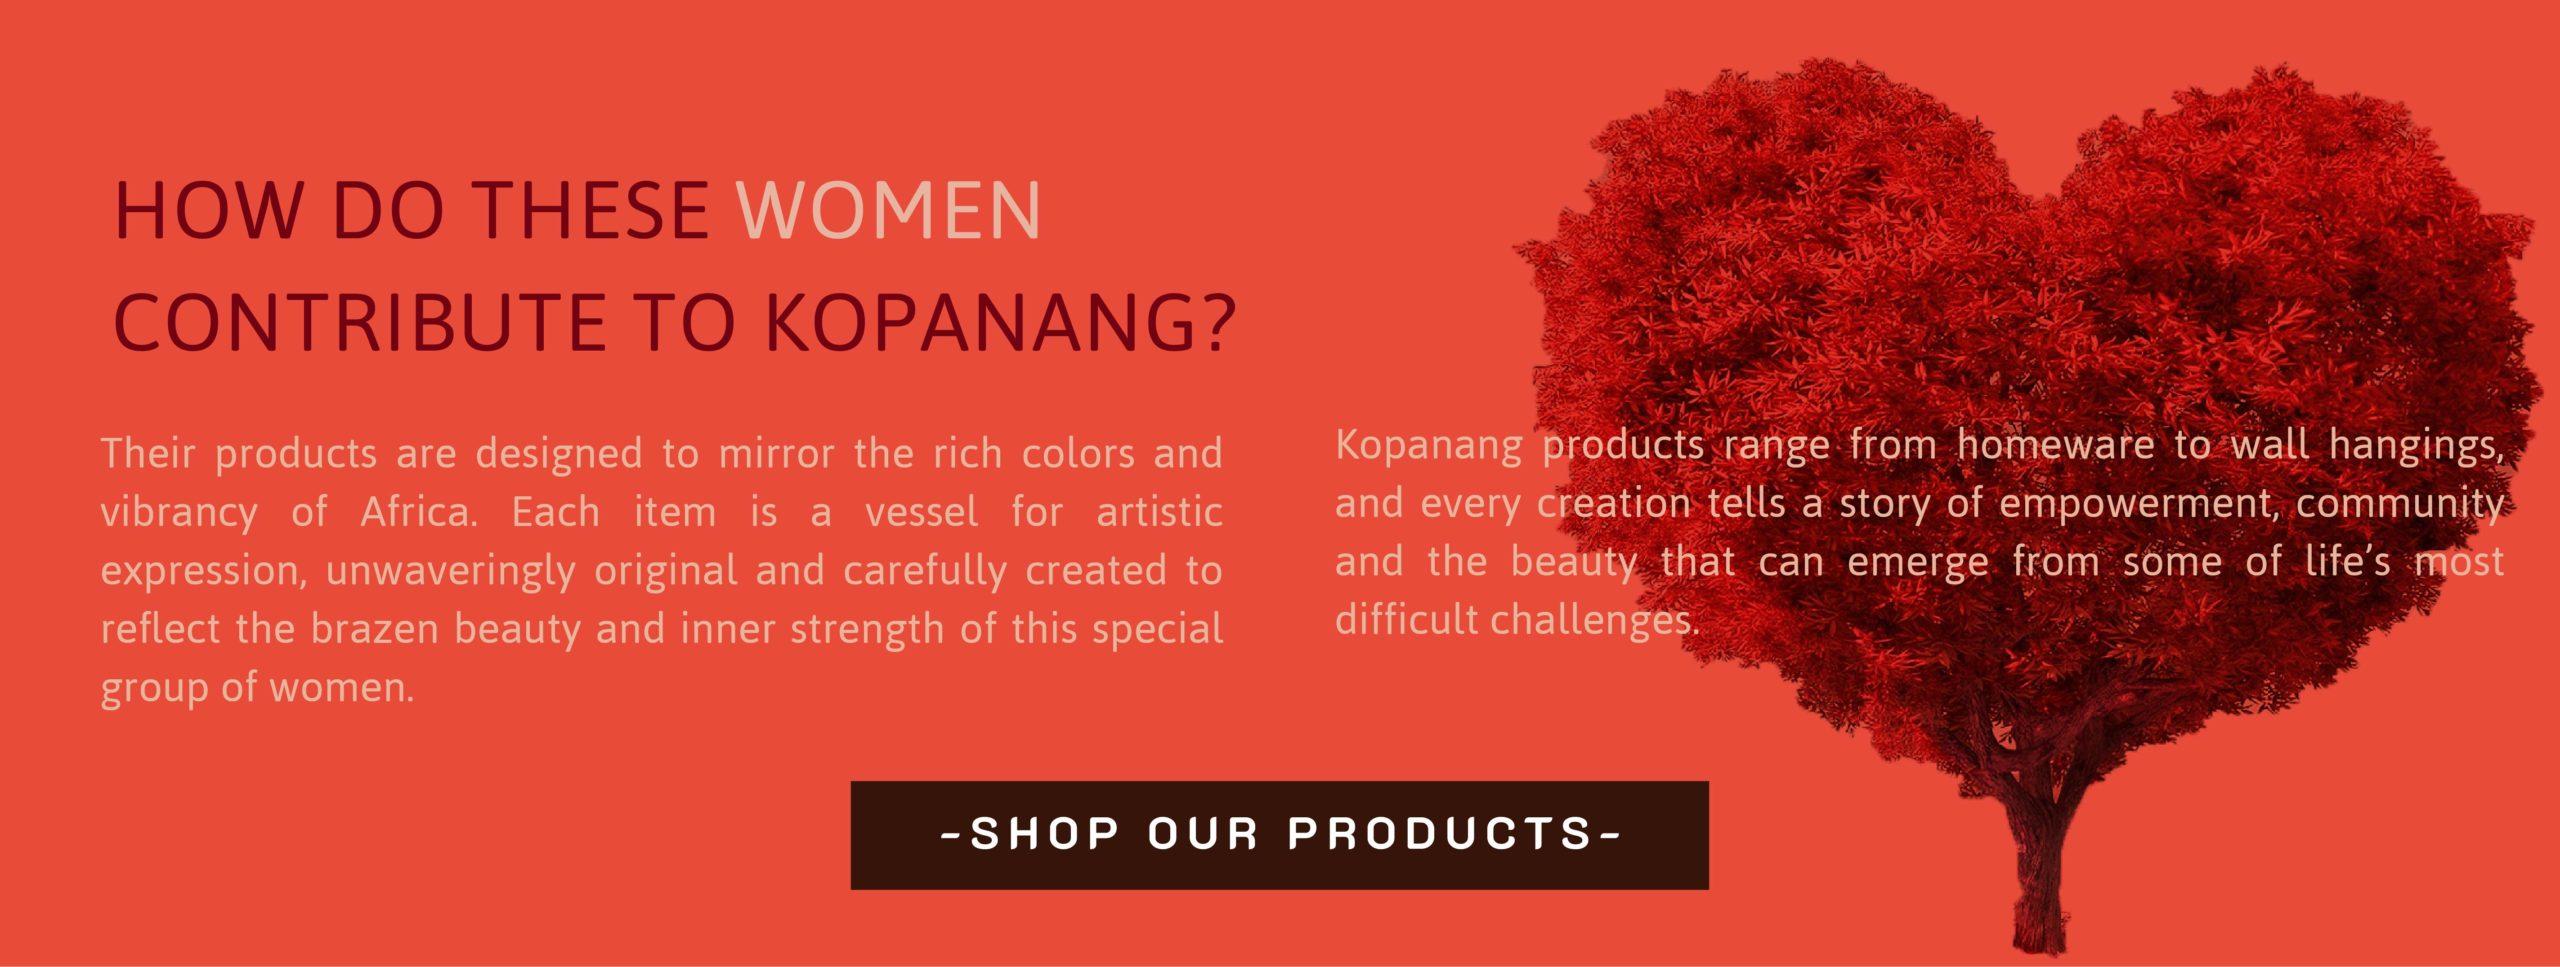 Kopanang banners_shop now